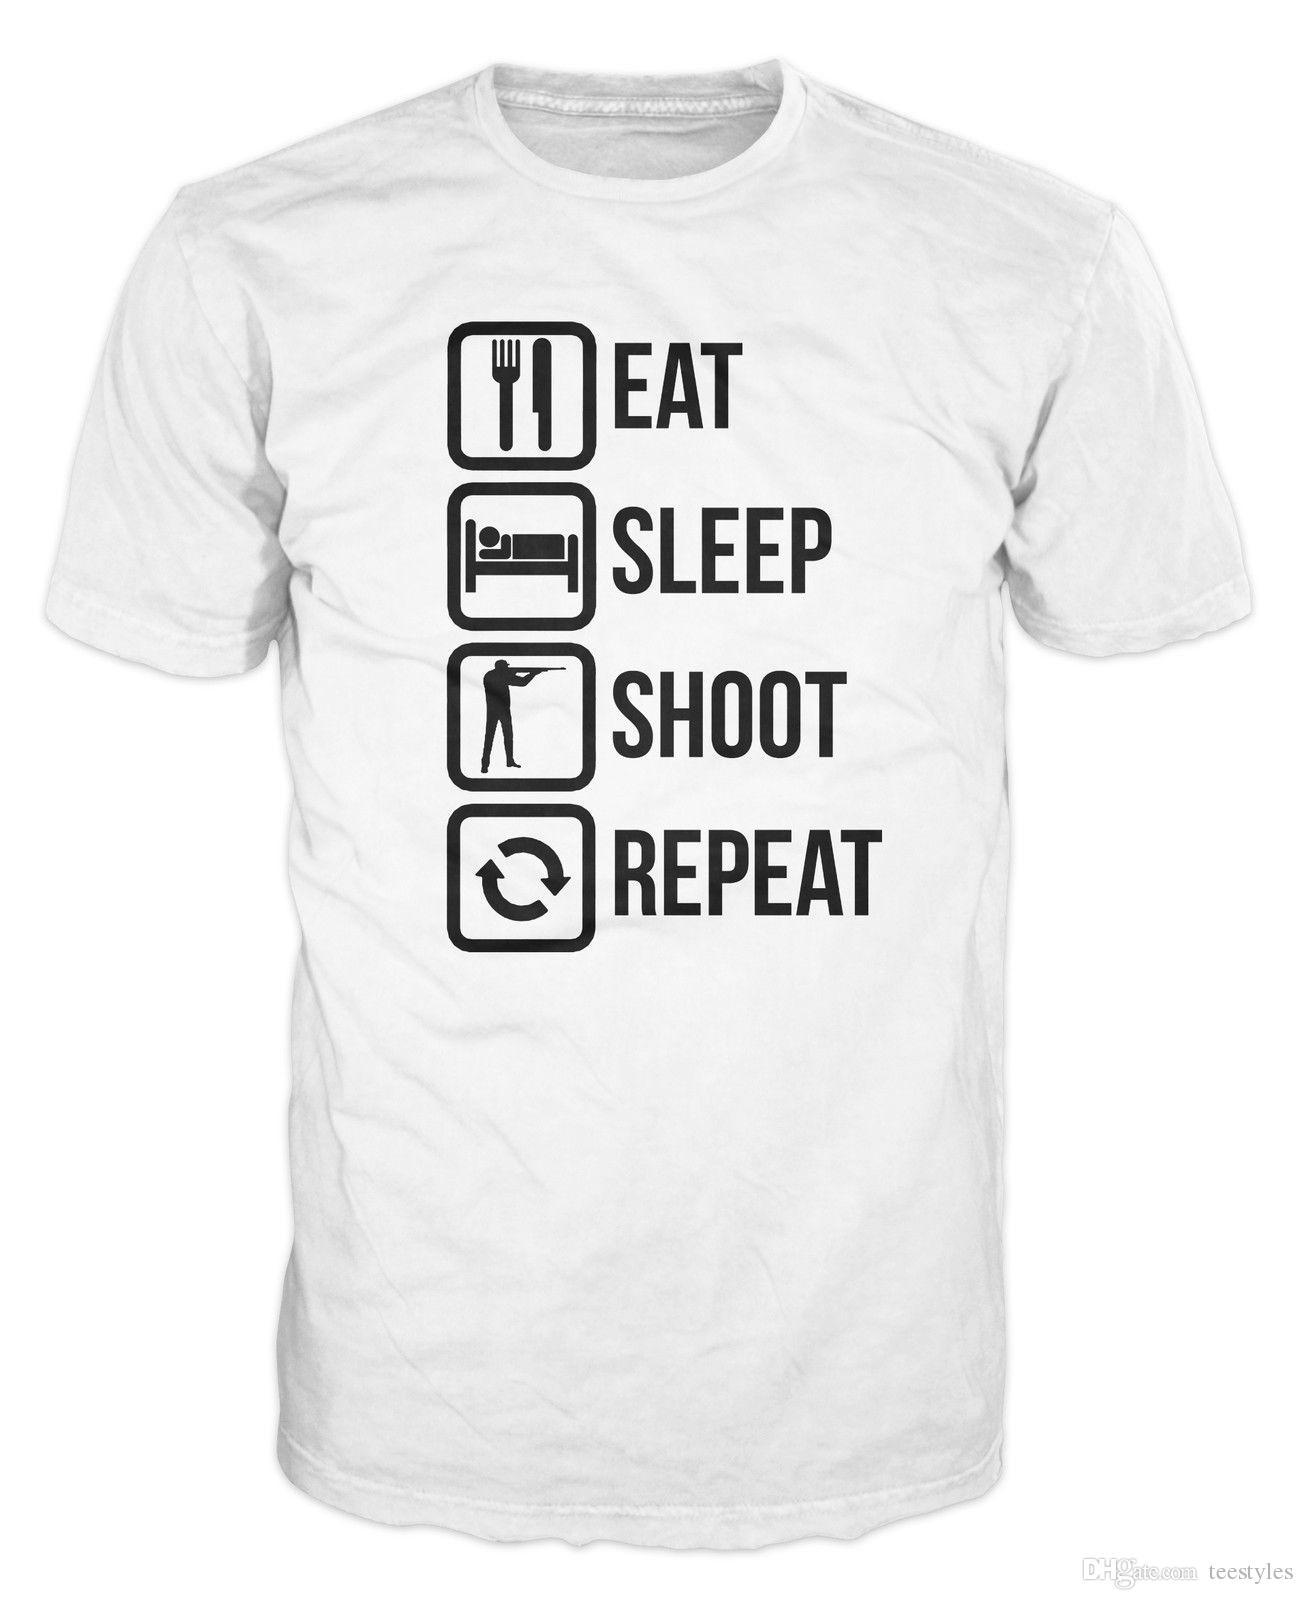 Eat sleep shoot repeat funny clay shooting sport olympics t shirt t shirt men mans designer custom short sleeve 3xl family camiseta